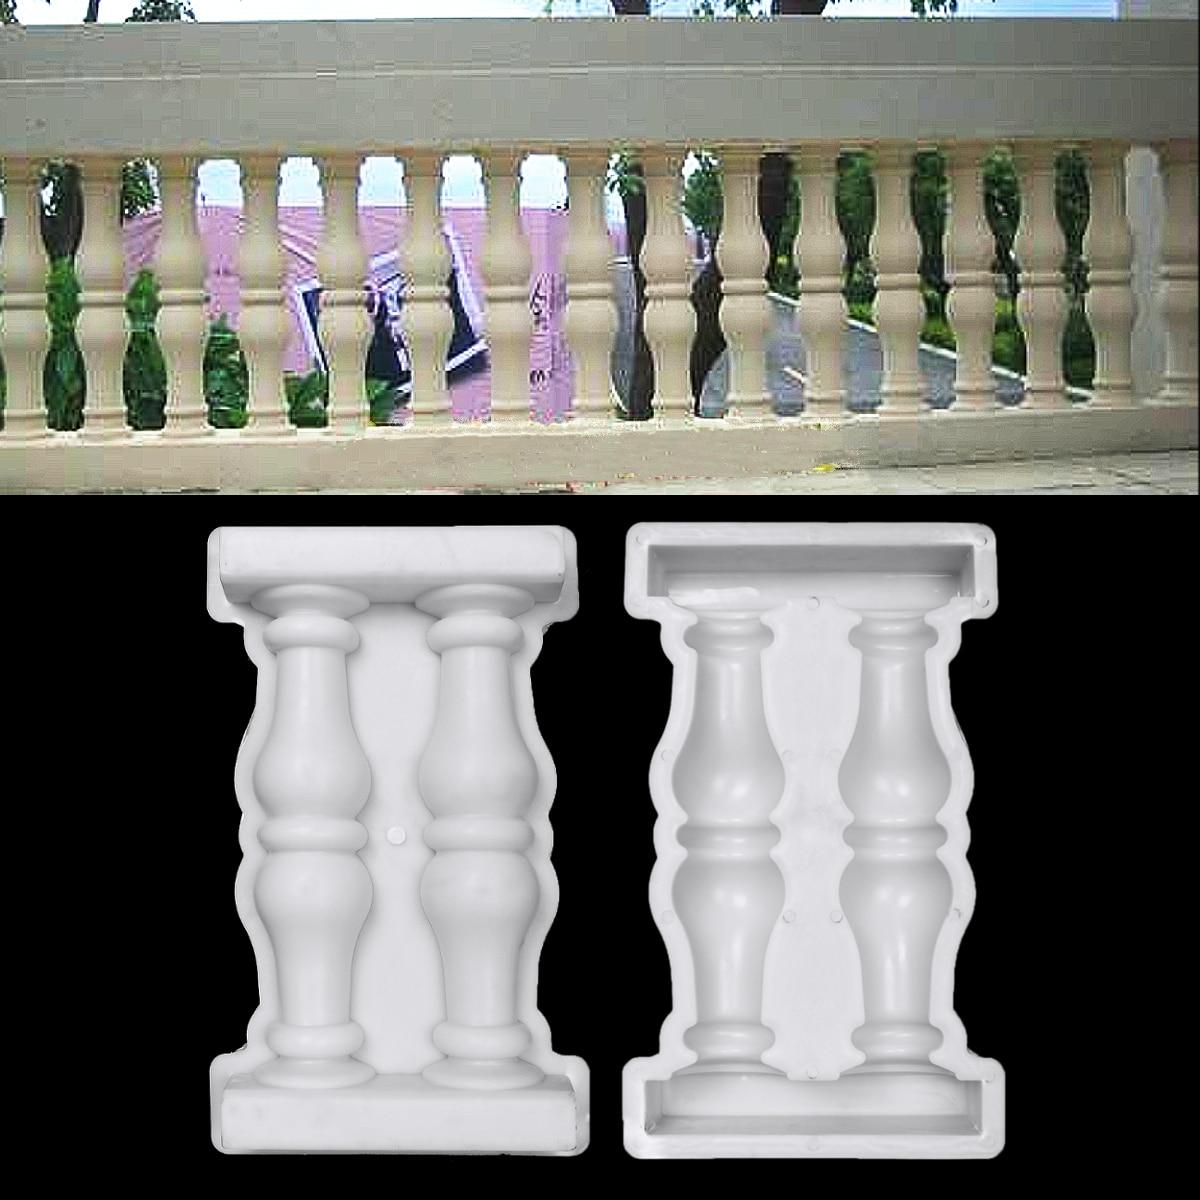 1pcs Garden Roman Column Mold Buildings Paving Molds DIY Balcony Garden Pool Fence Cement Railing Plaster Concrete Mold 50x28cm